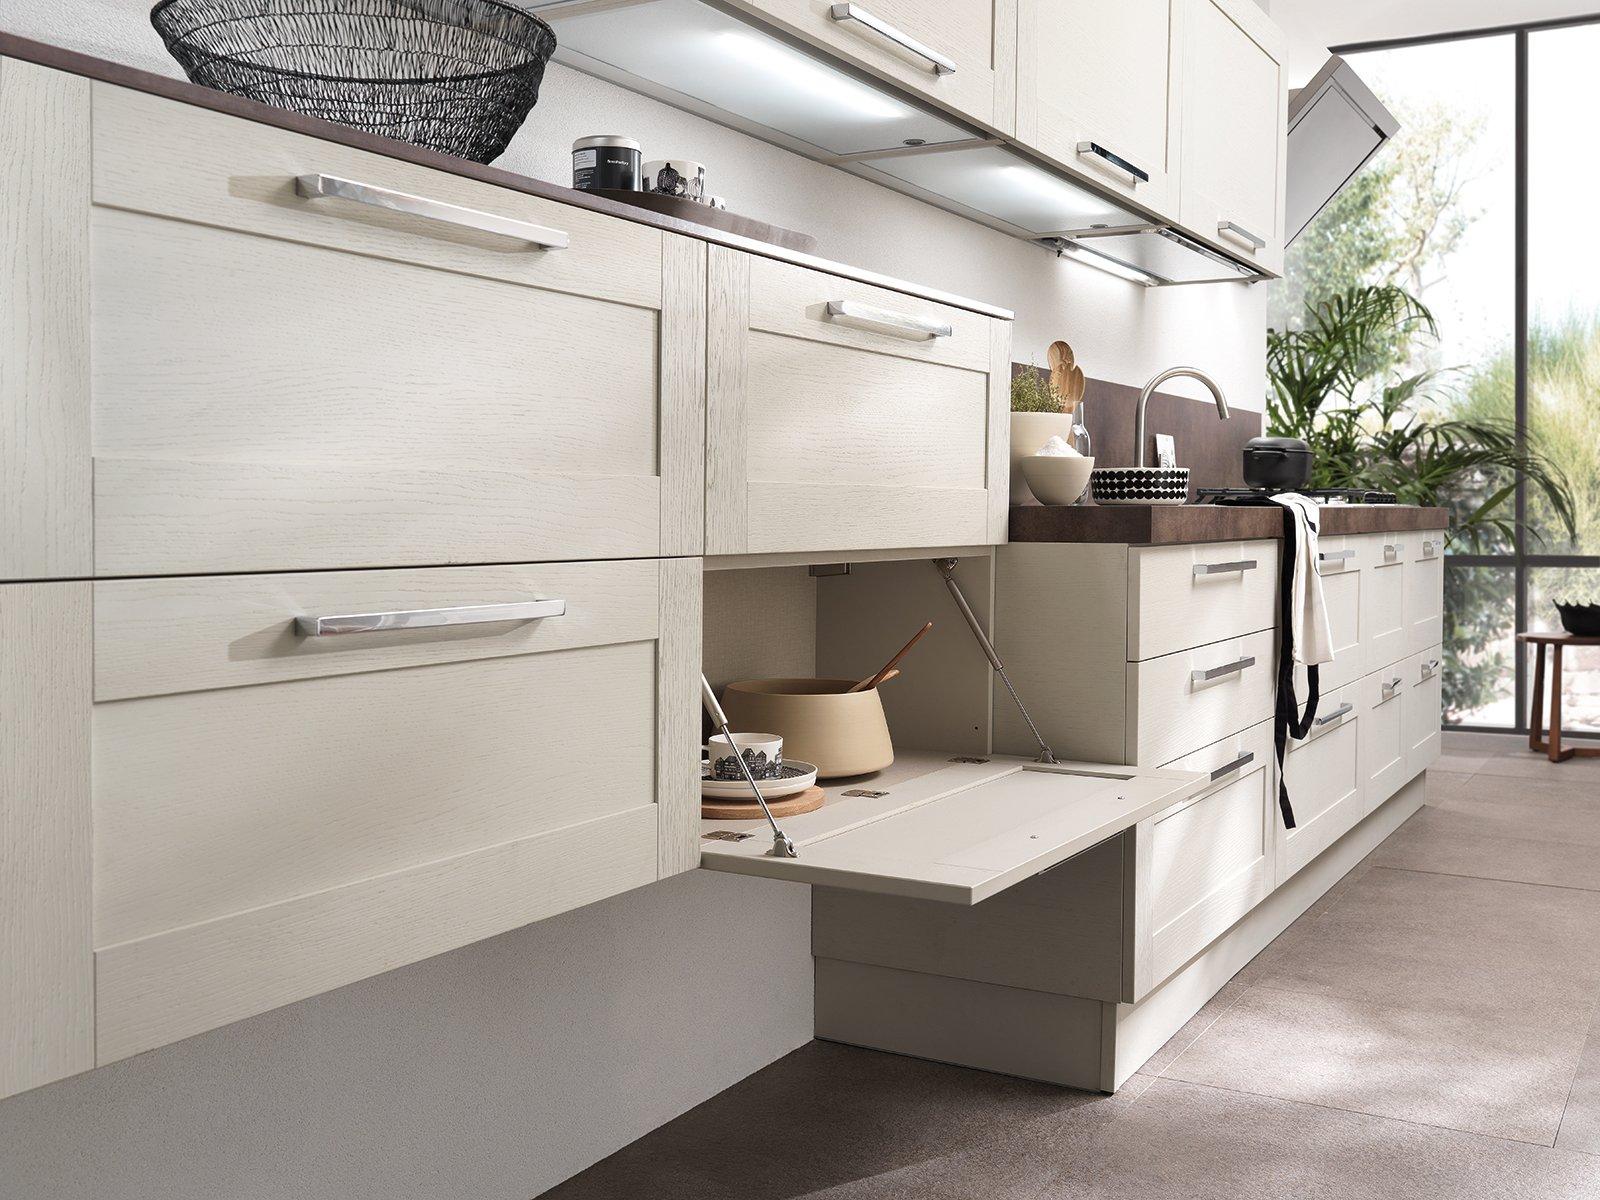 Stunning Cucina Bambini Scavolini Contemporary - Home Interior ...